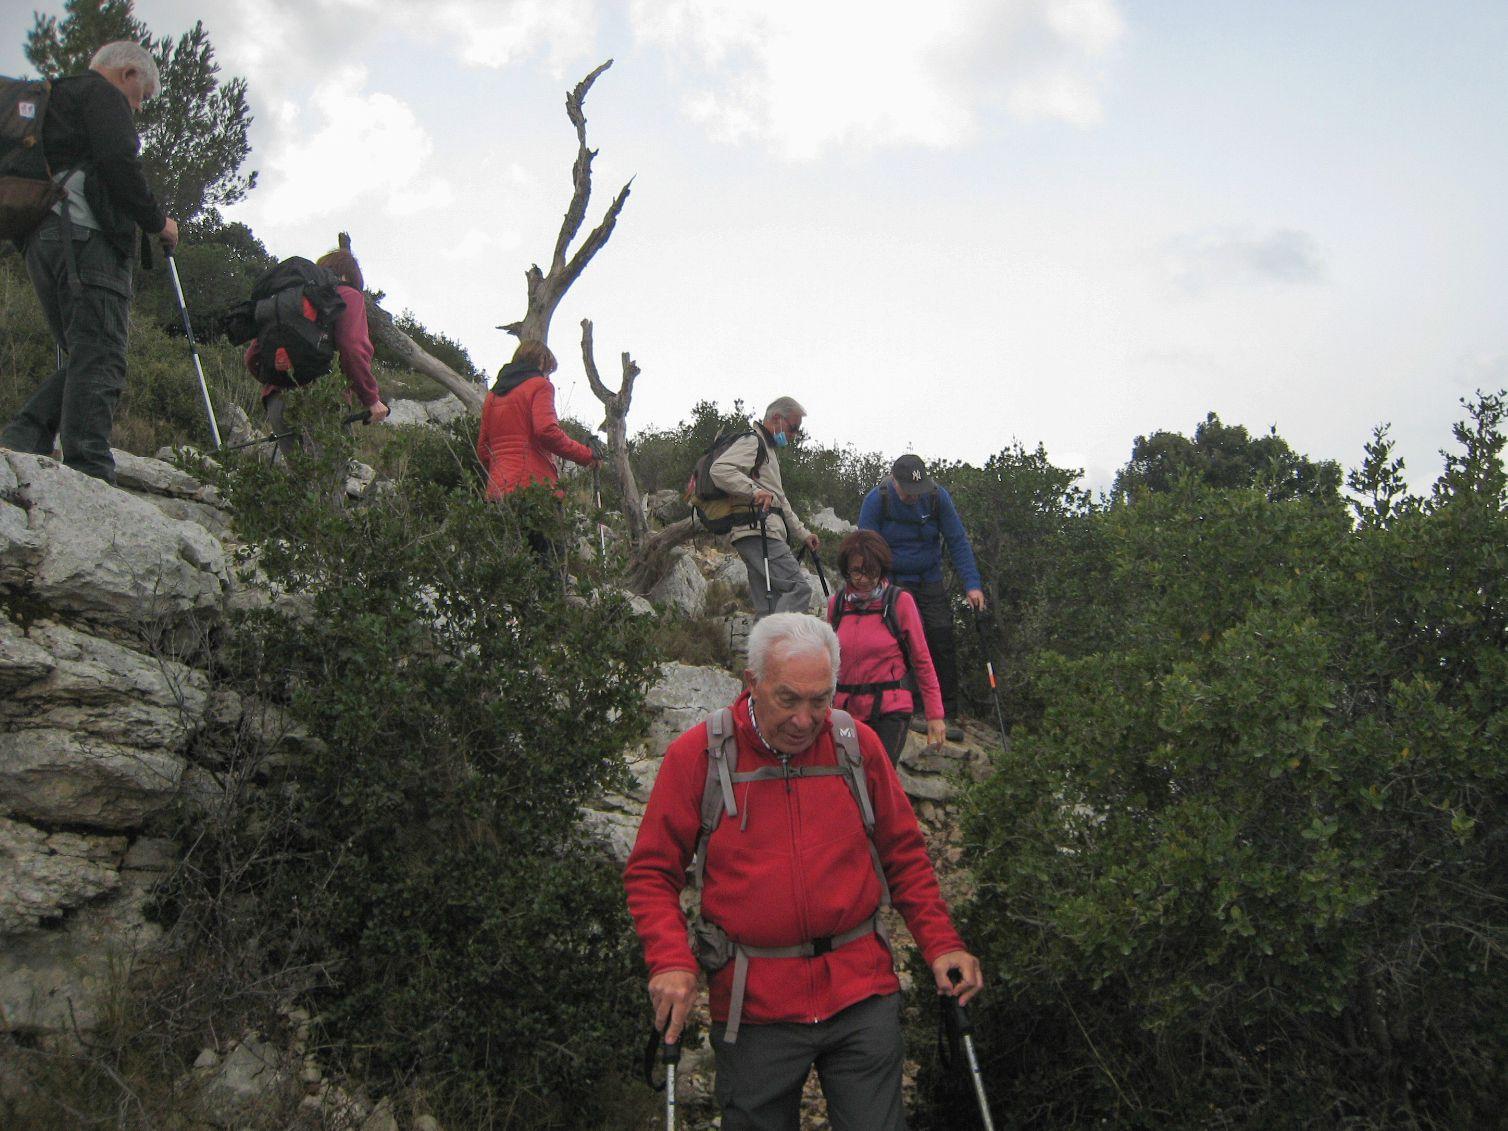 Rando du 8 mars 2021 : Mont du Marseillais